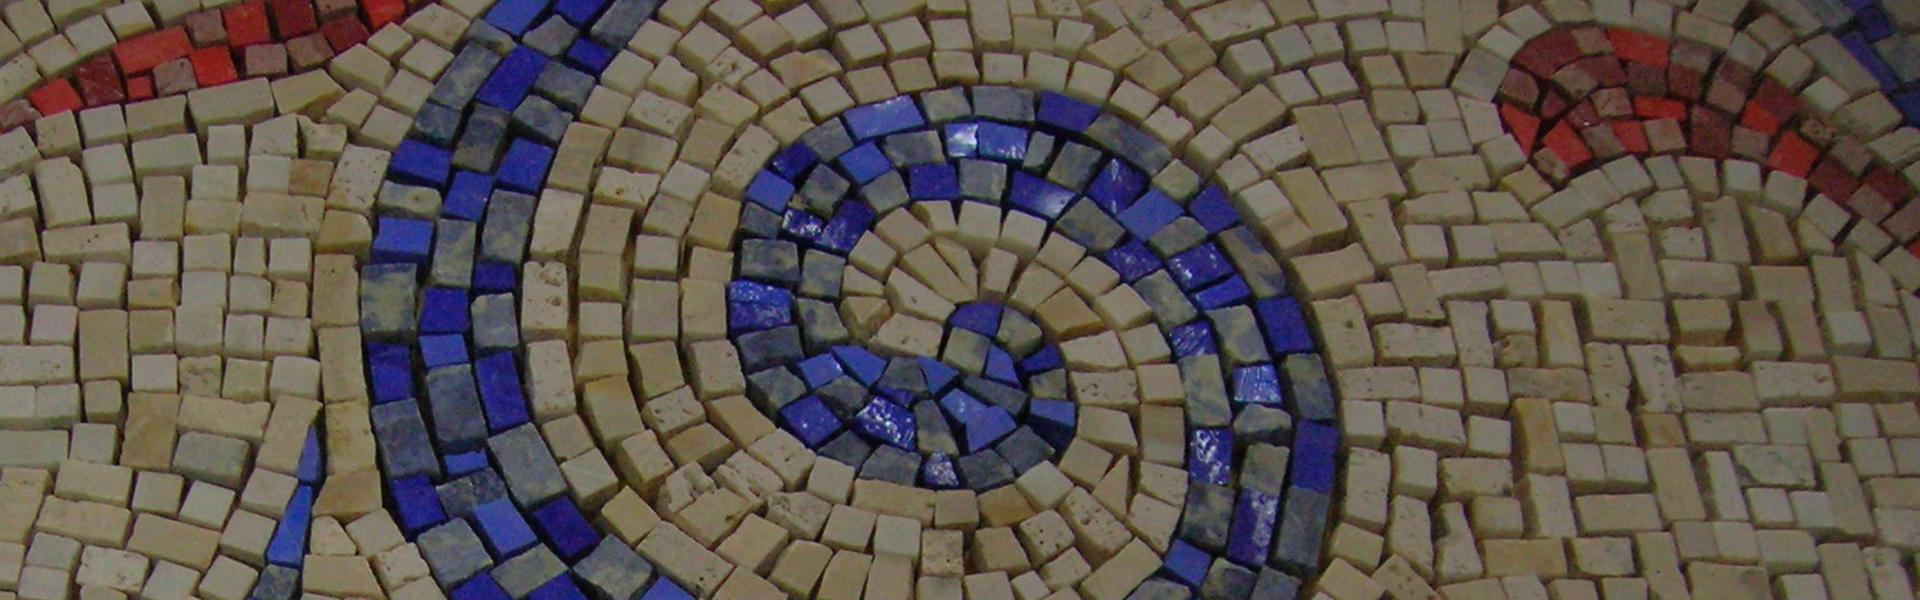 pavimento mosaico